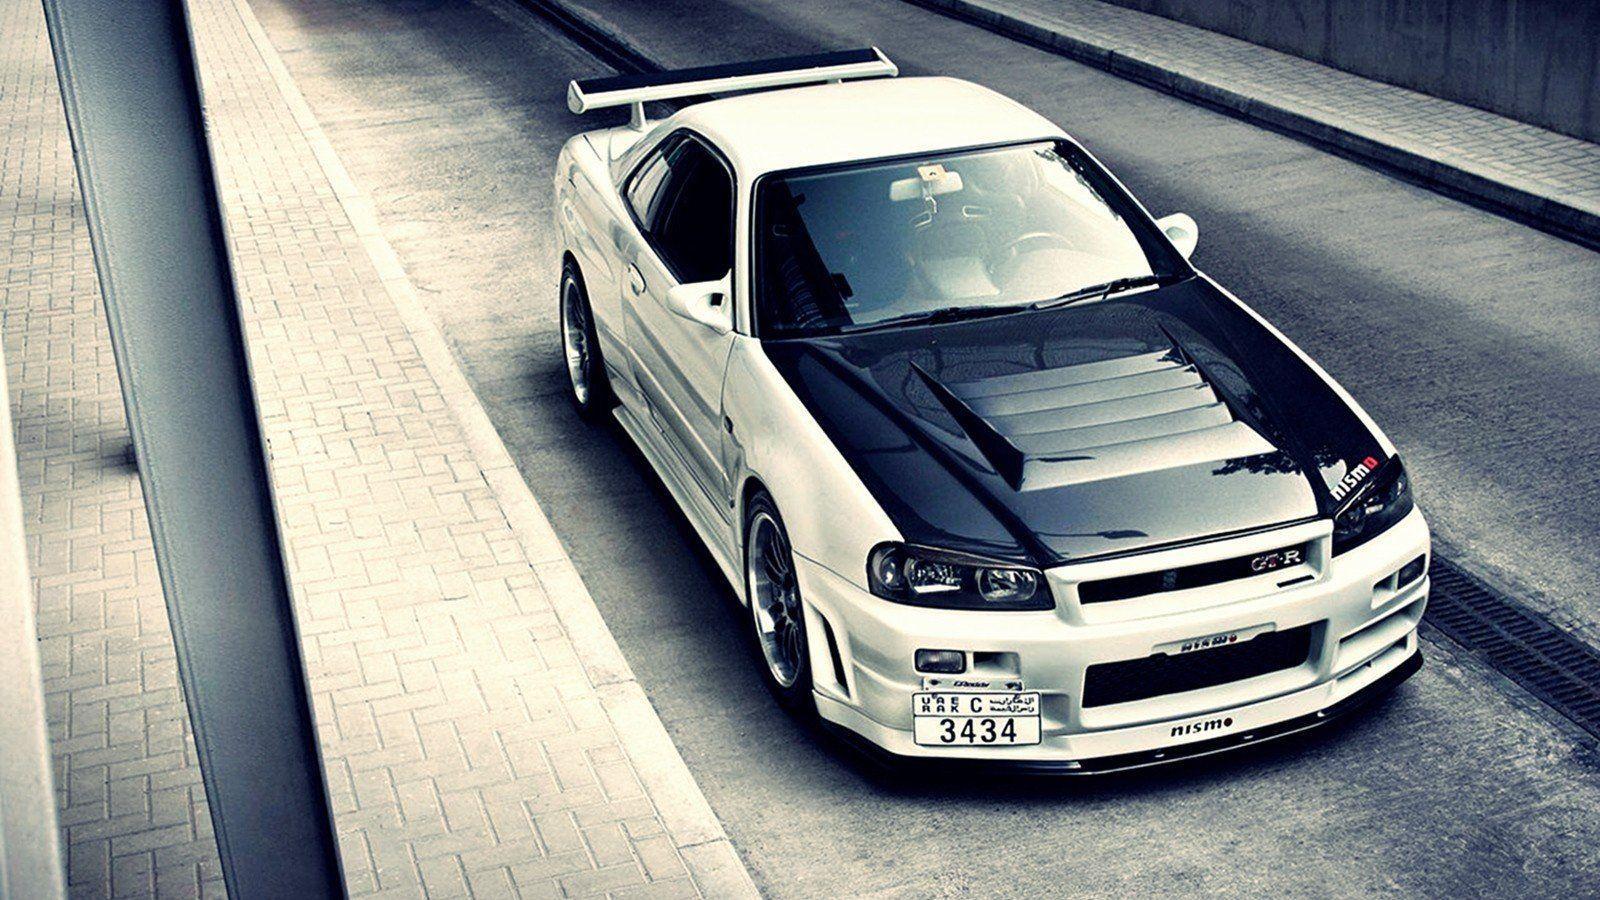 Nissan Skyline GTR R Wallpaper Free Desktop Wallpapers 1024×768 ...